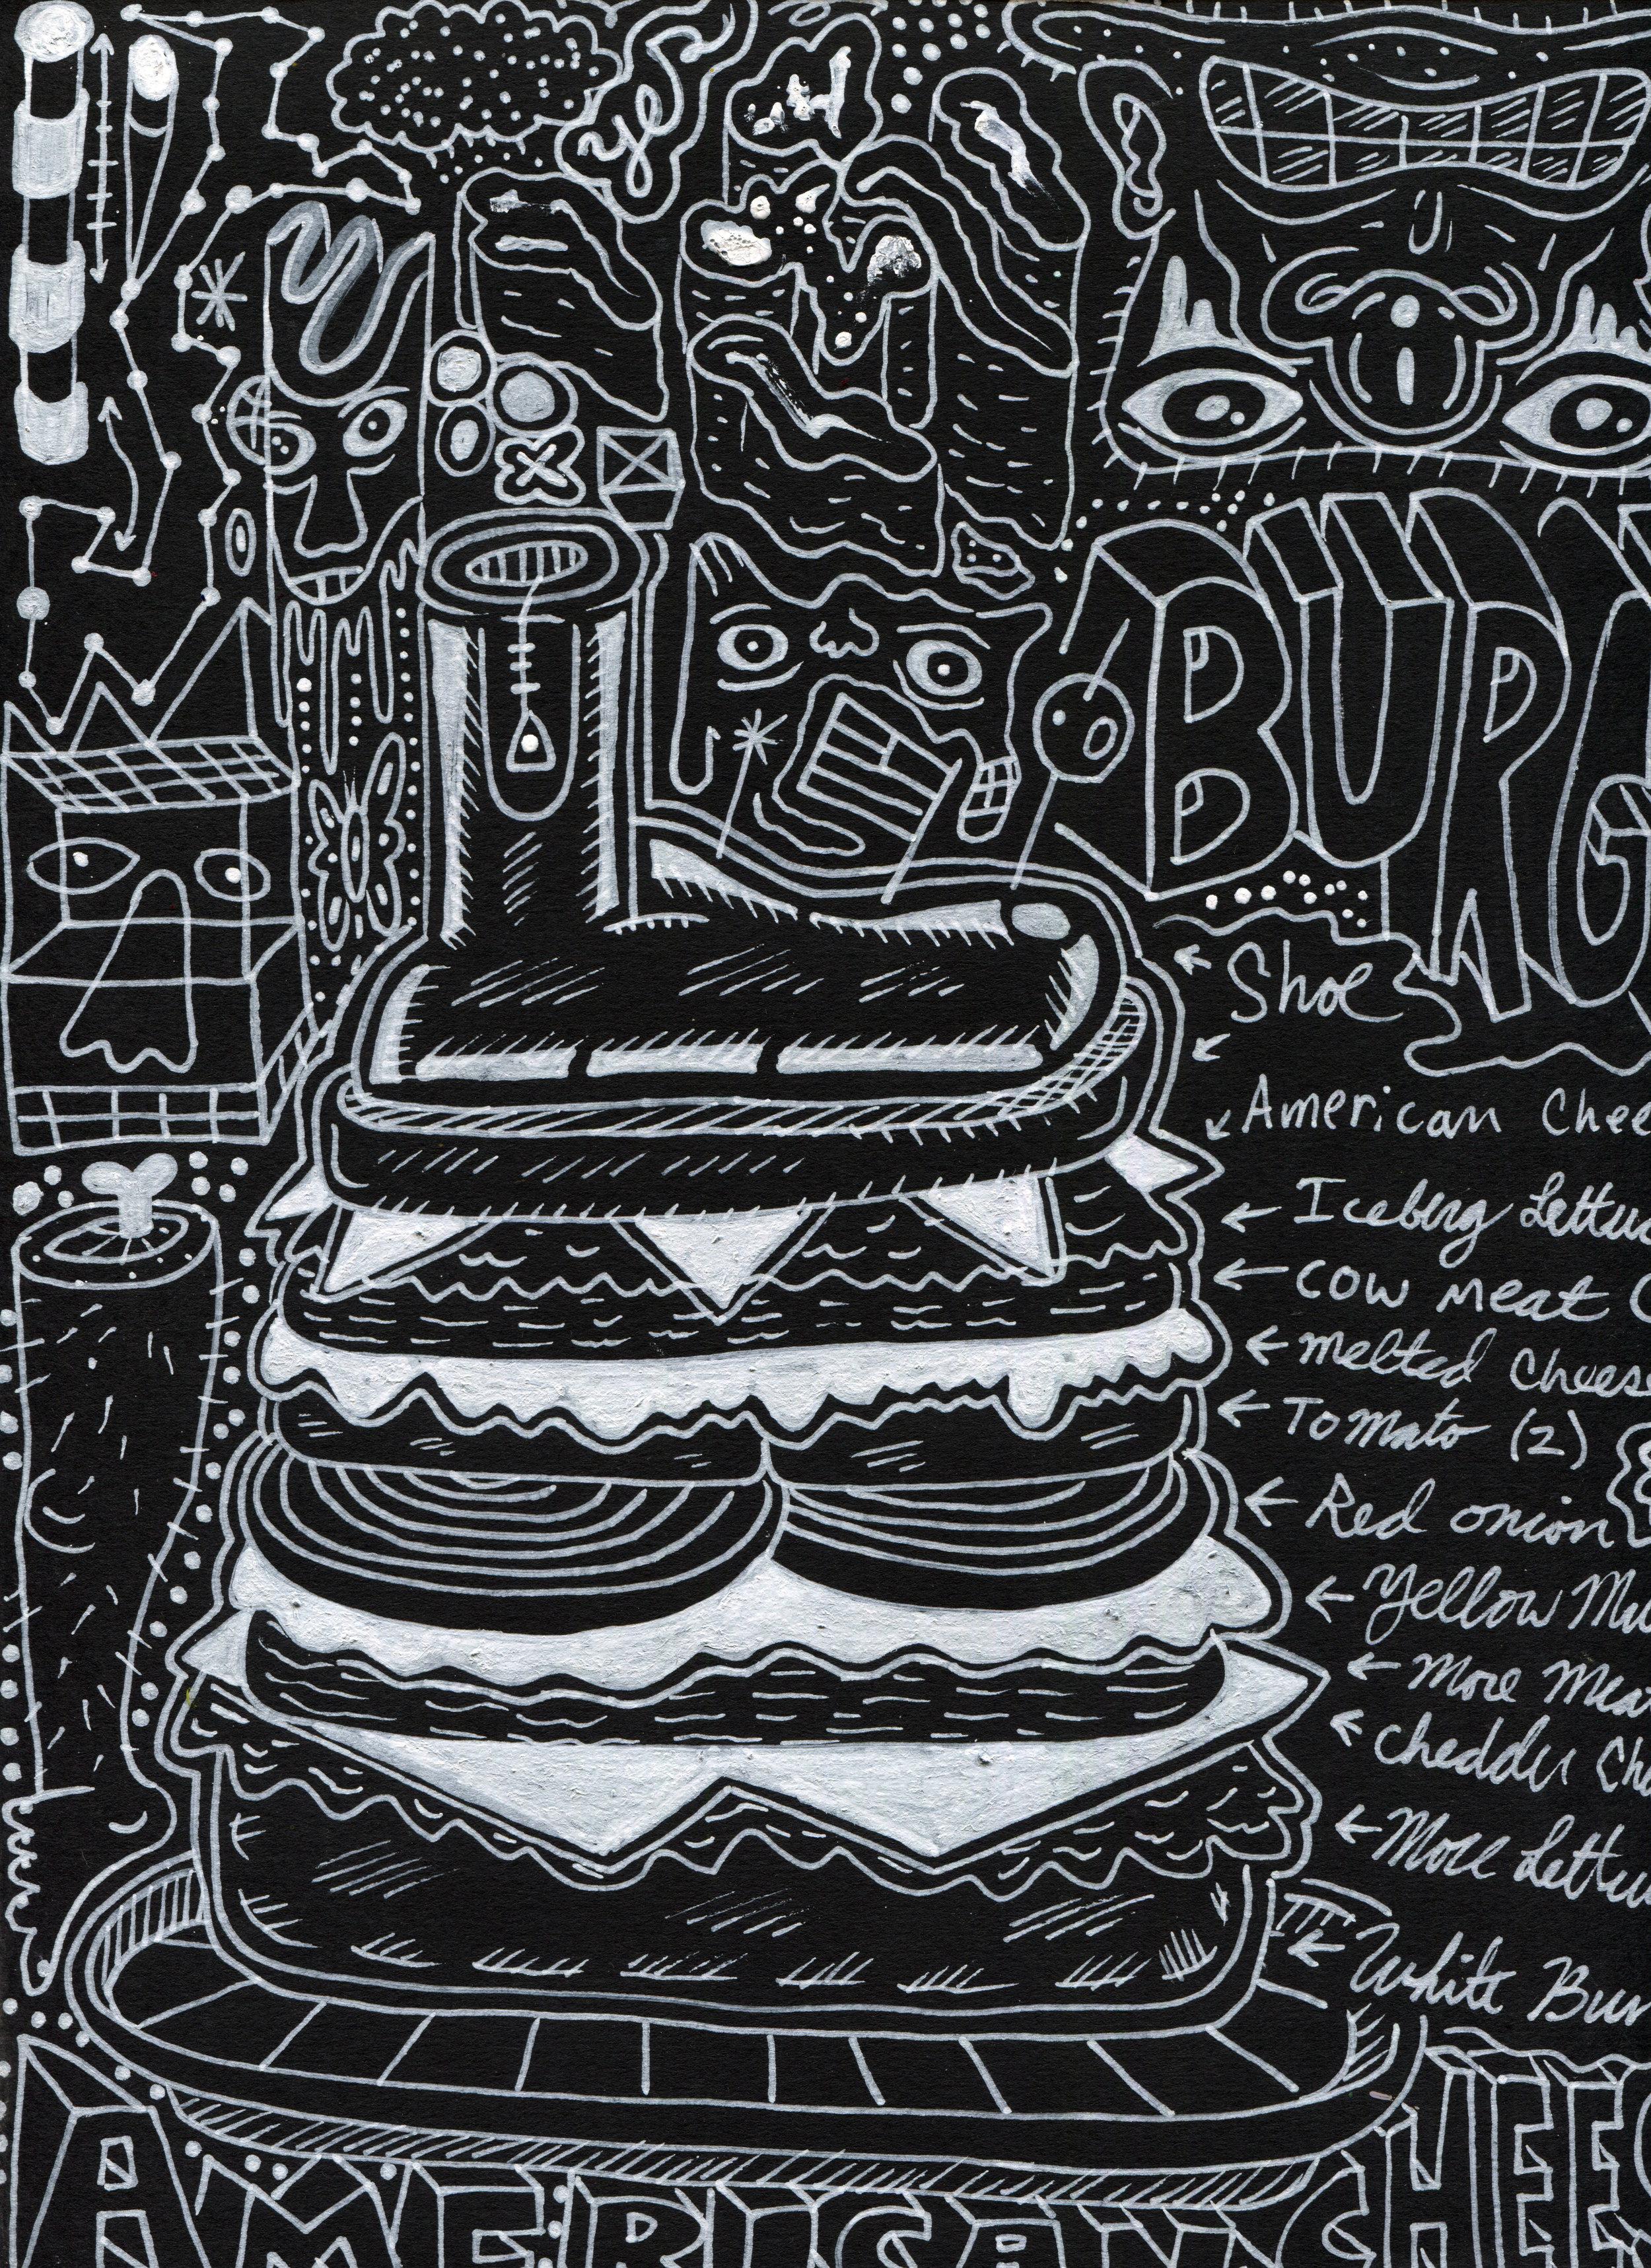 Cheeseburger Boot